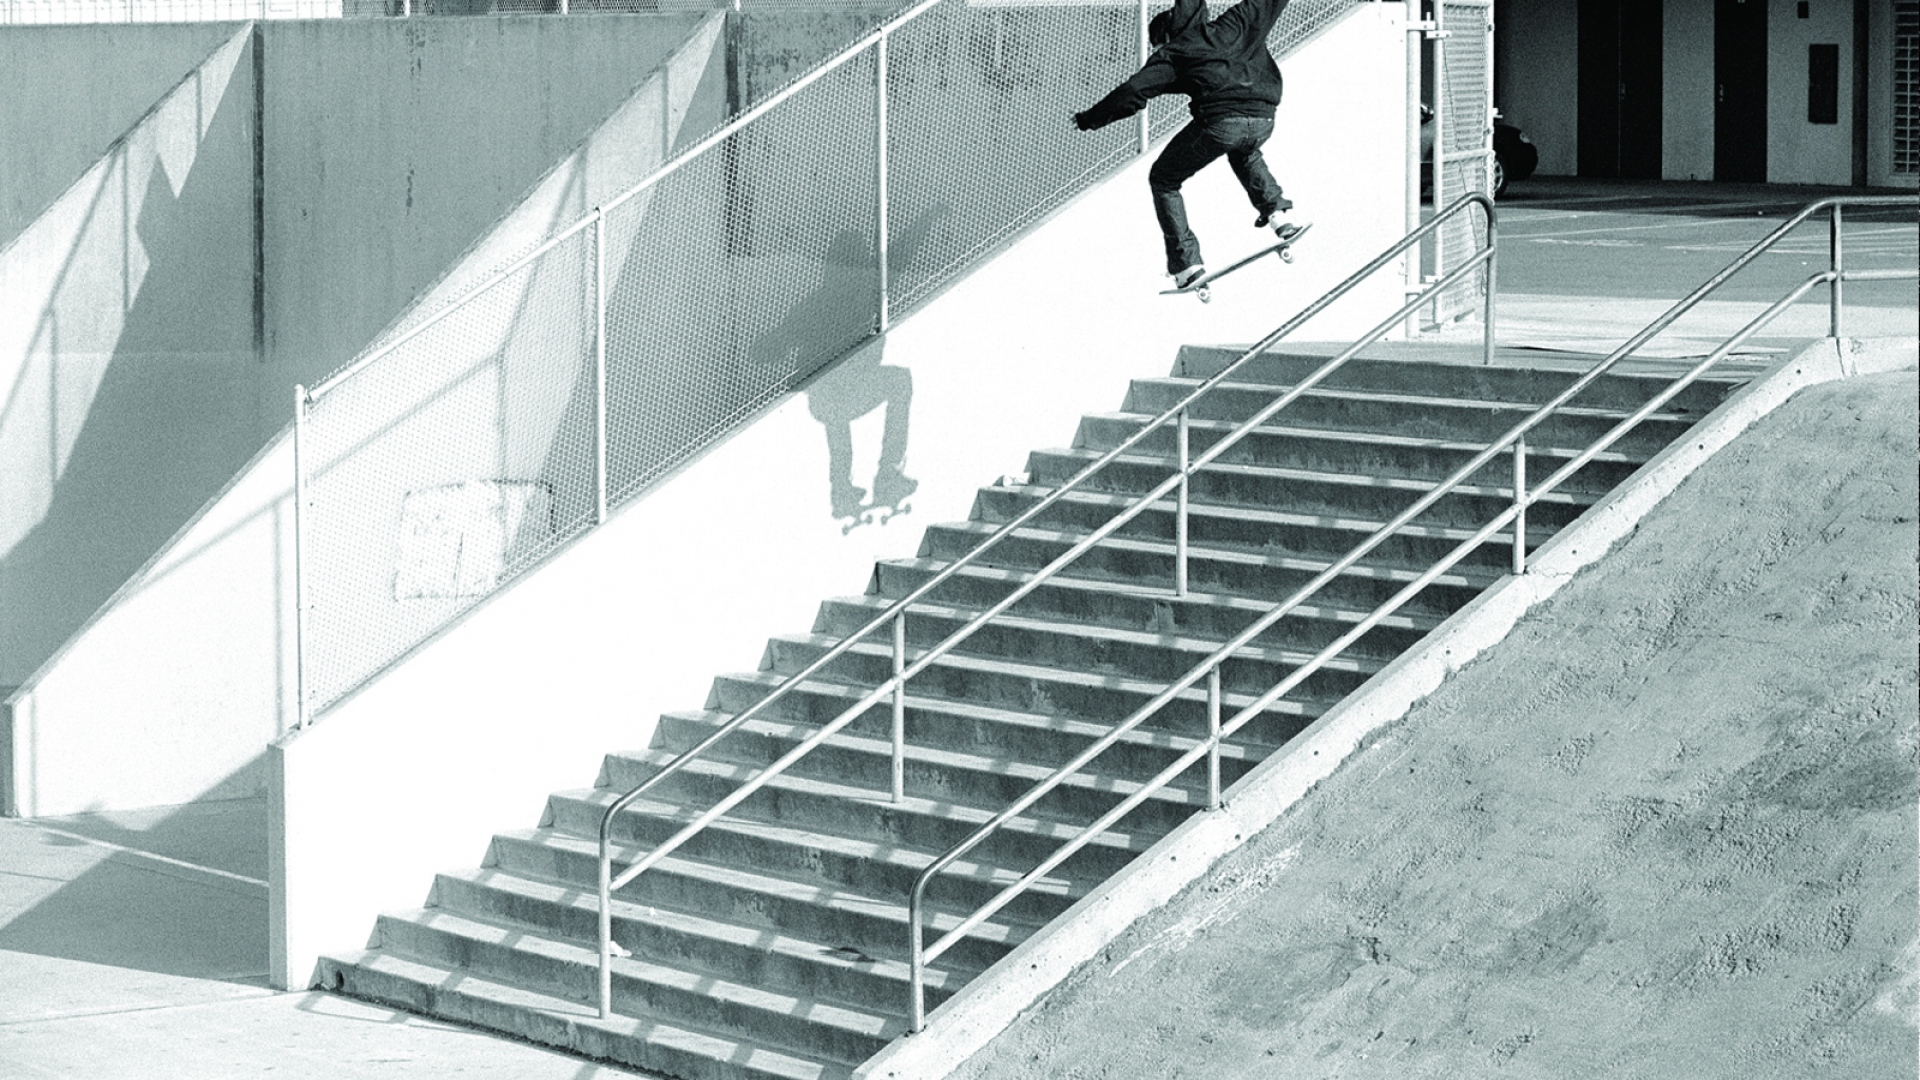 Download Wallpaper 1920x1080 Ryan Smith Jump Skateboard Ladder Steps Trick Full Hd 1080p Hd Background